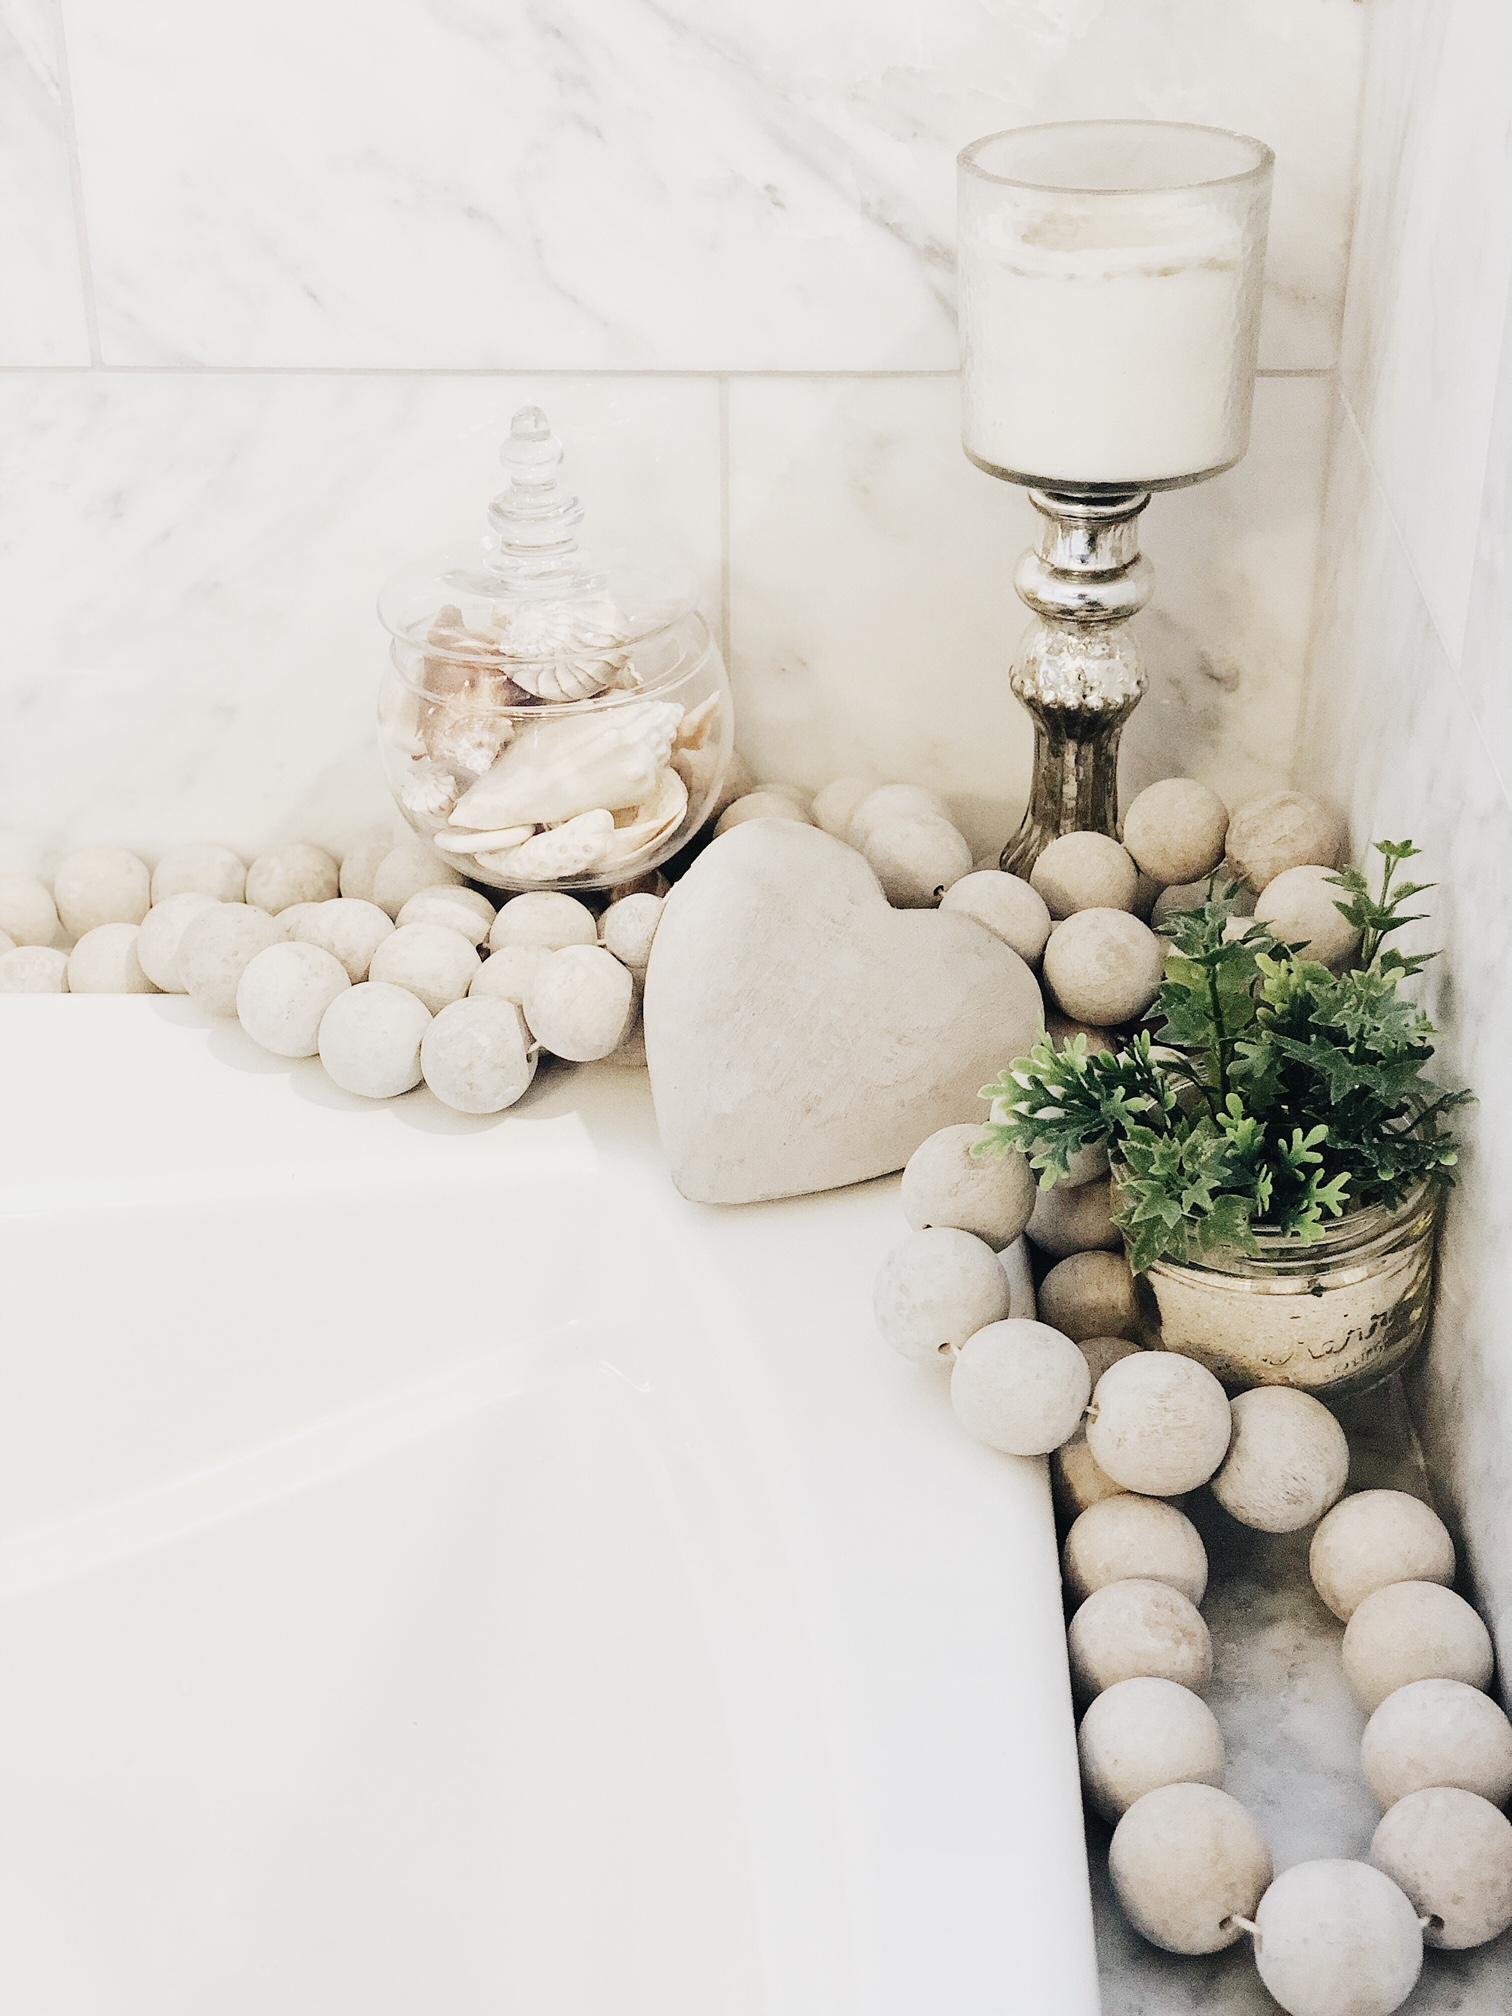 prayerbeadswithheart-bath.jpg